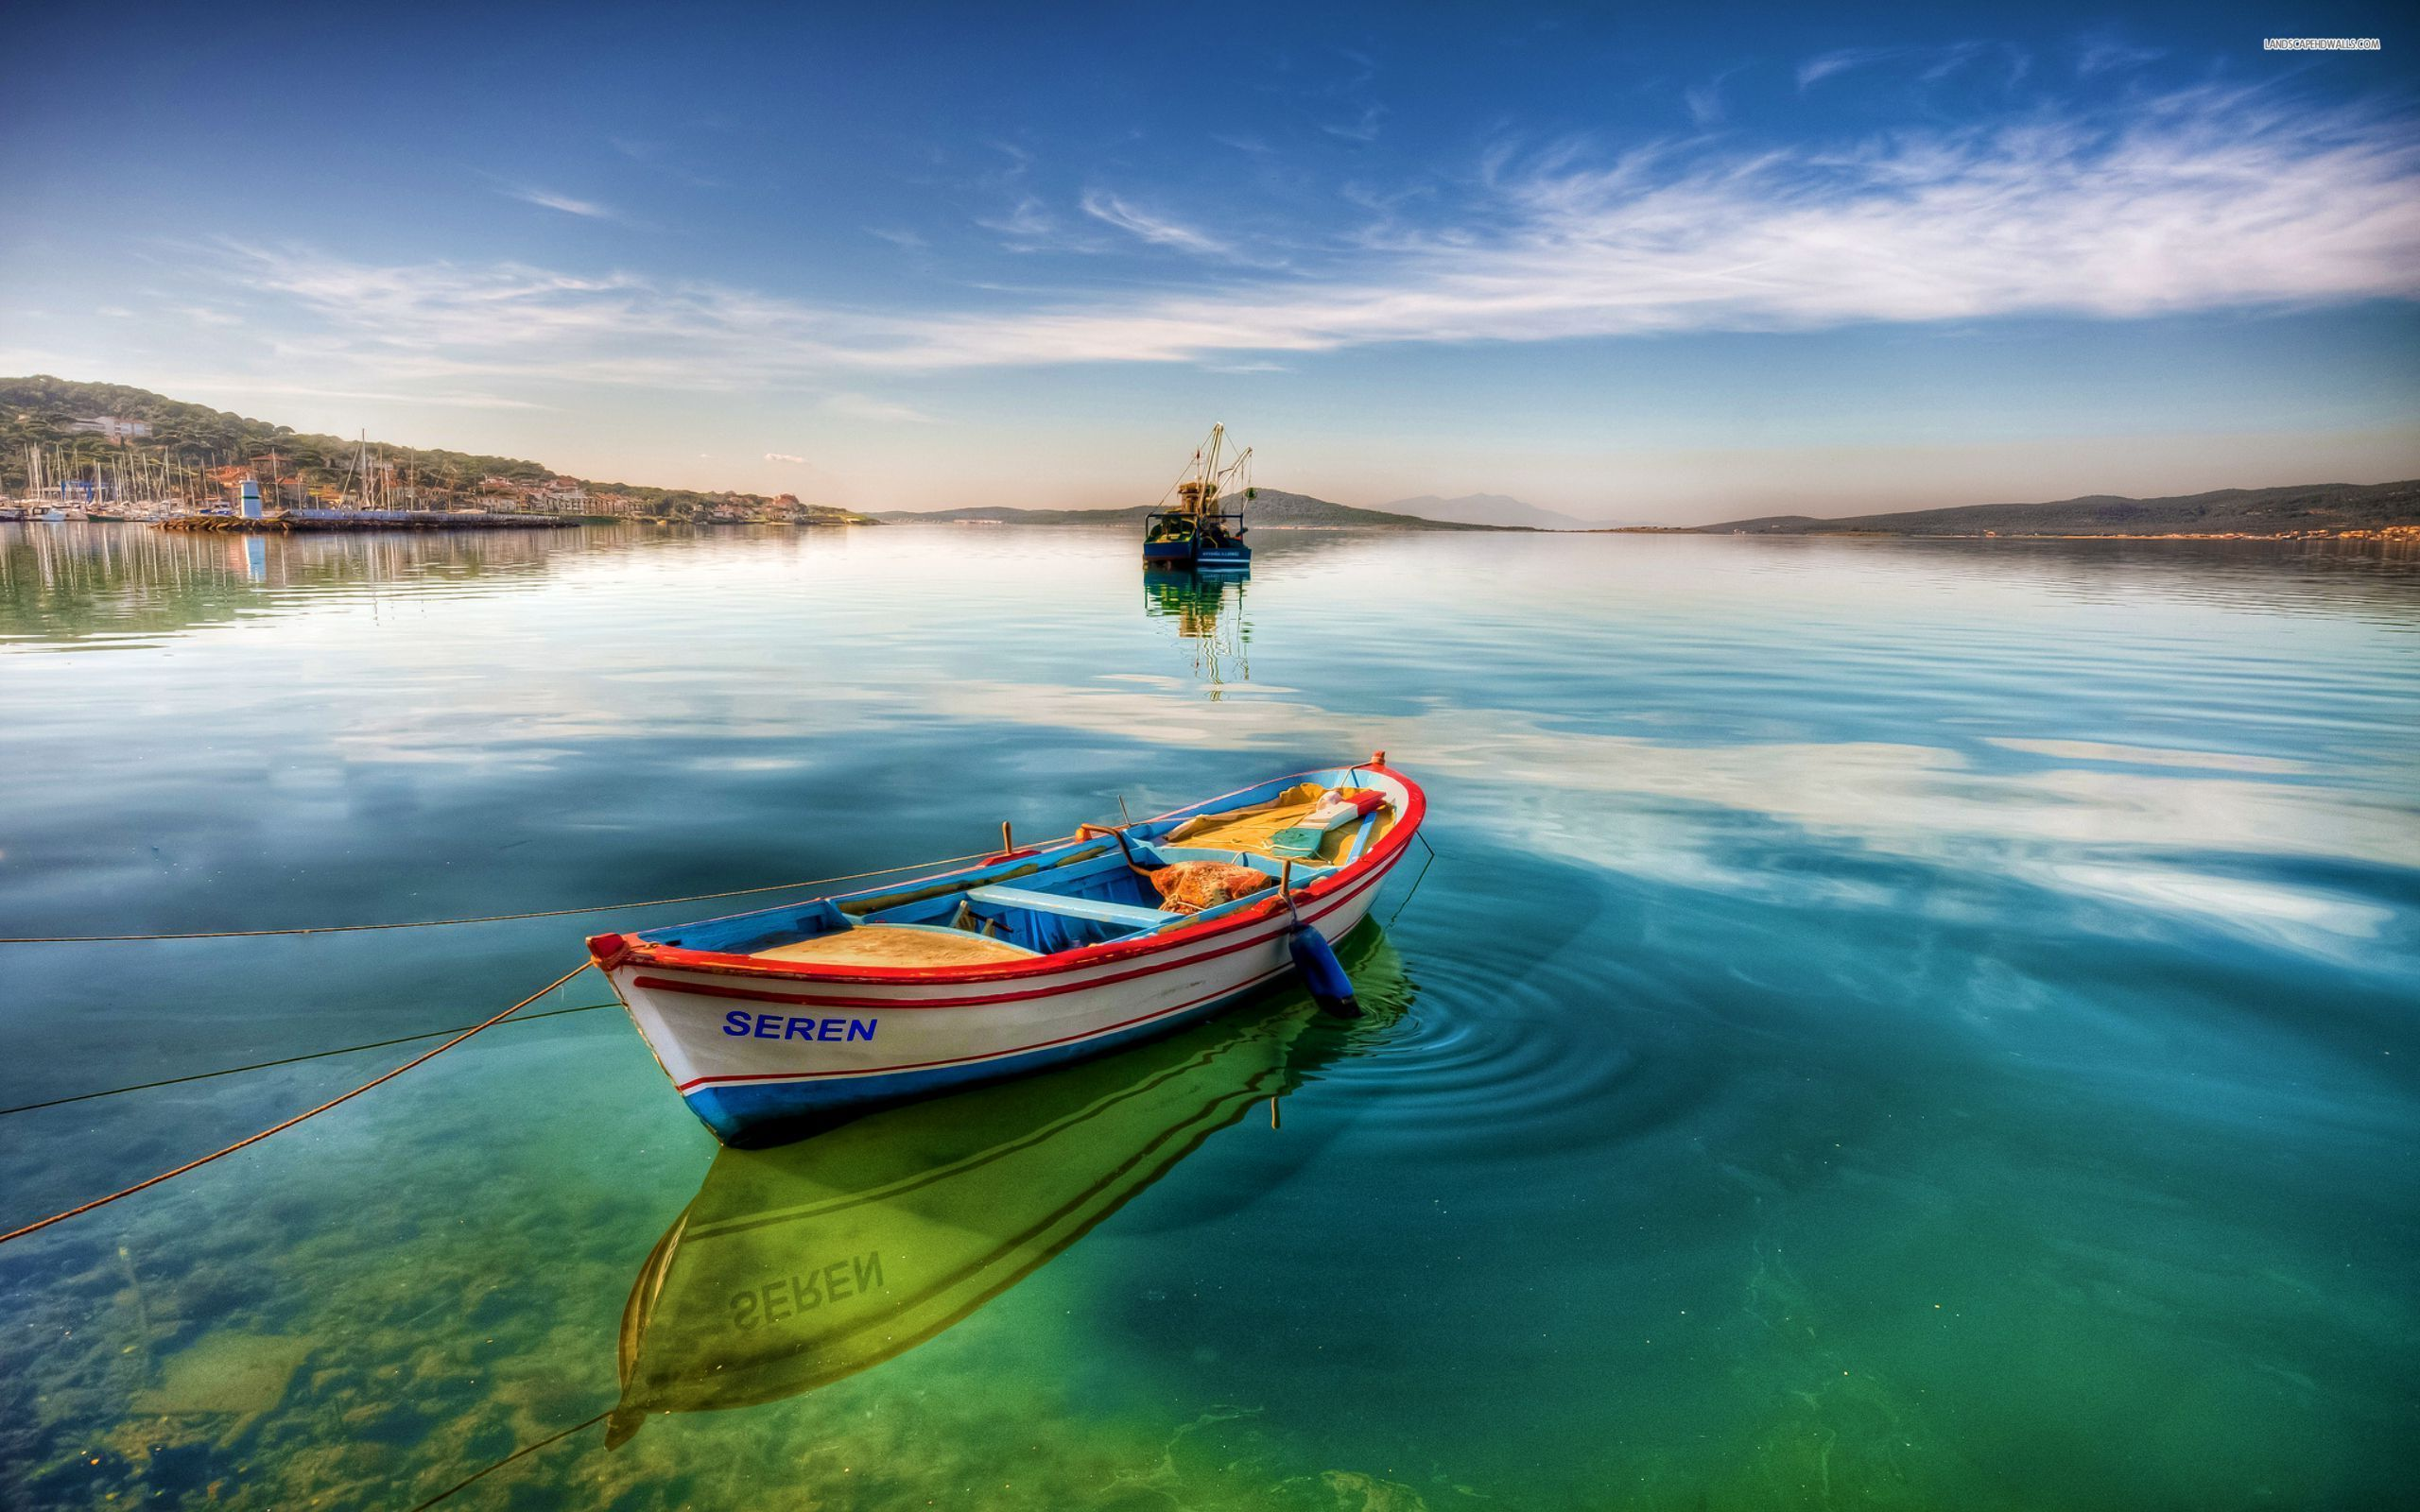 Boat on Clear Water HD Wallpapers WallpapersCharlie Лодка